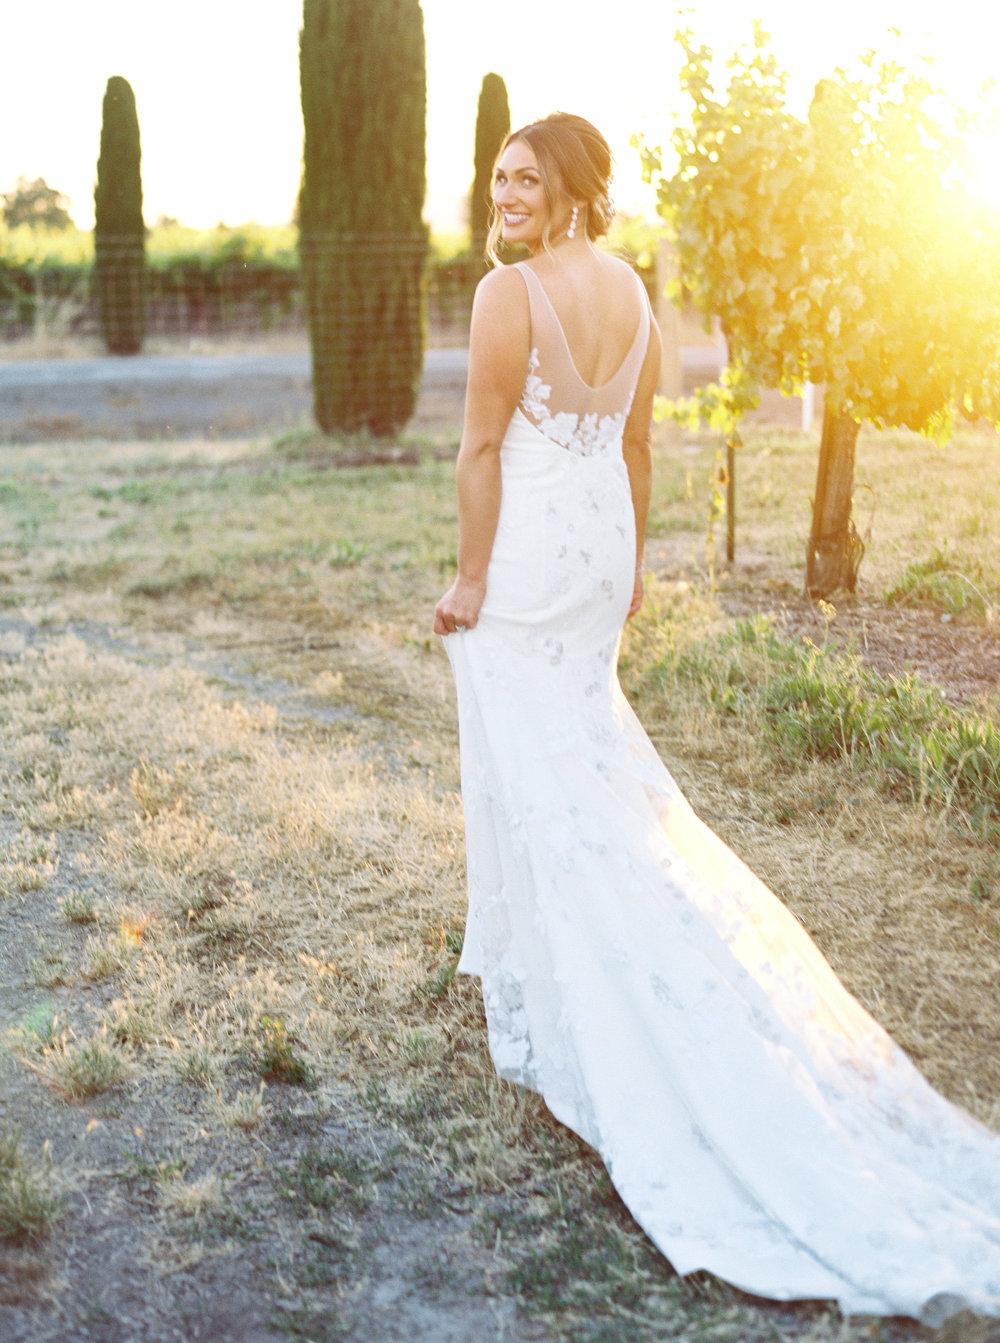 vintners-inn-wedding-in-santa-rosa-california-212.jpg